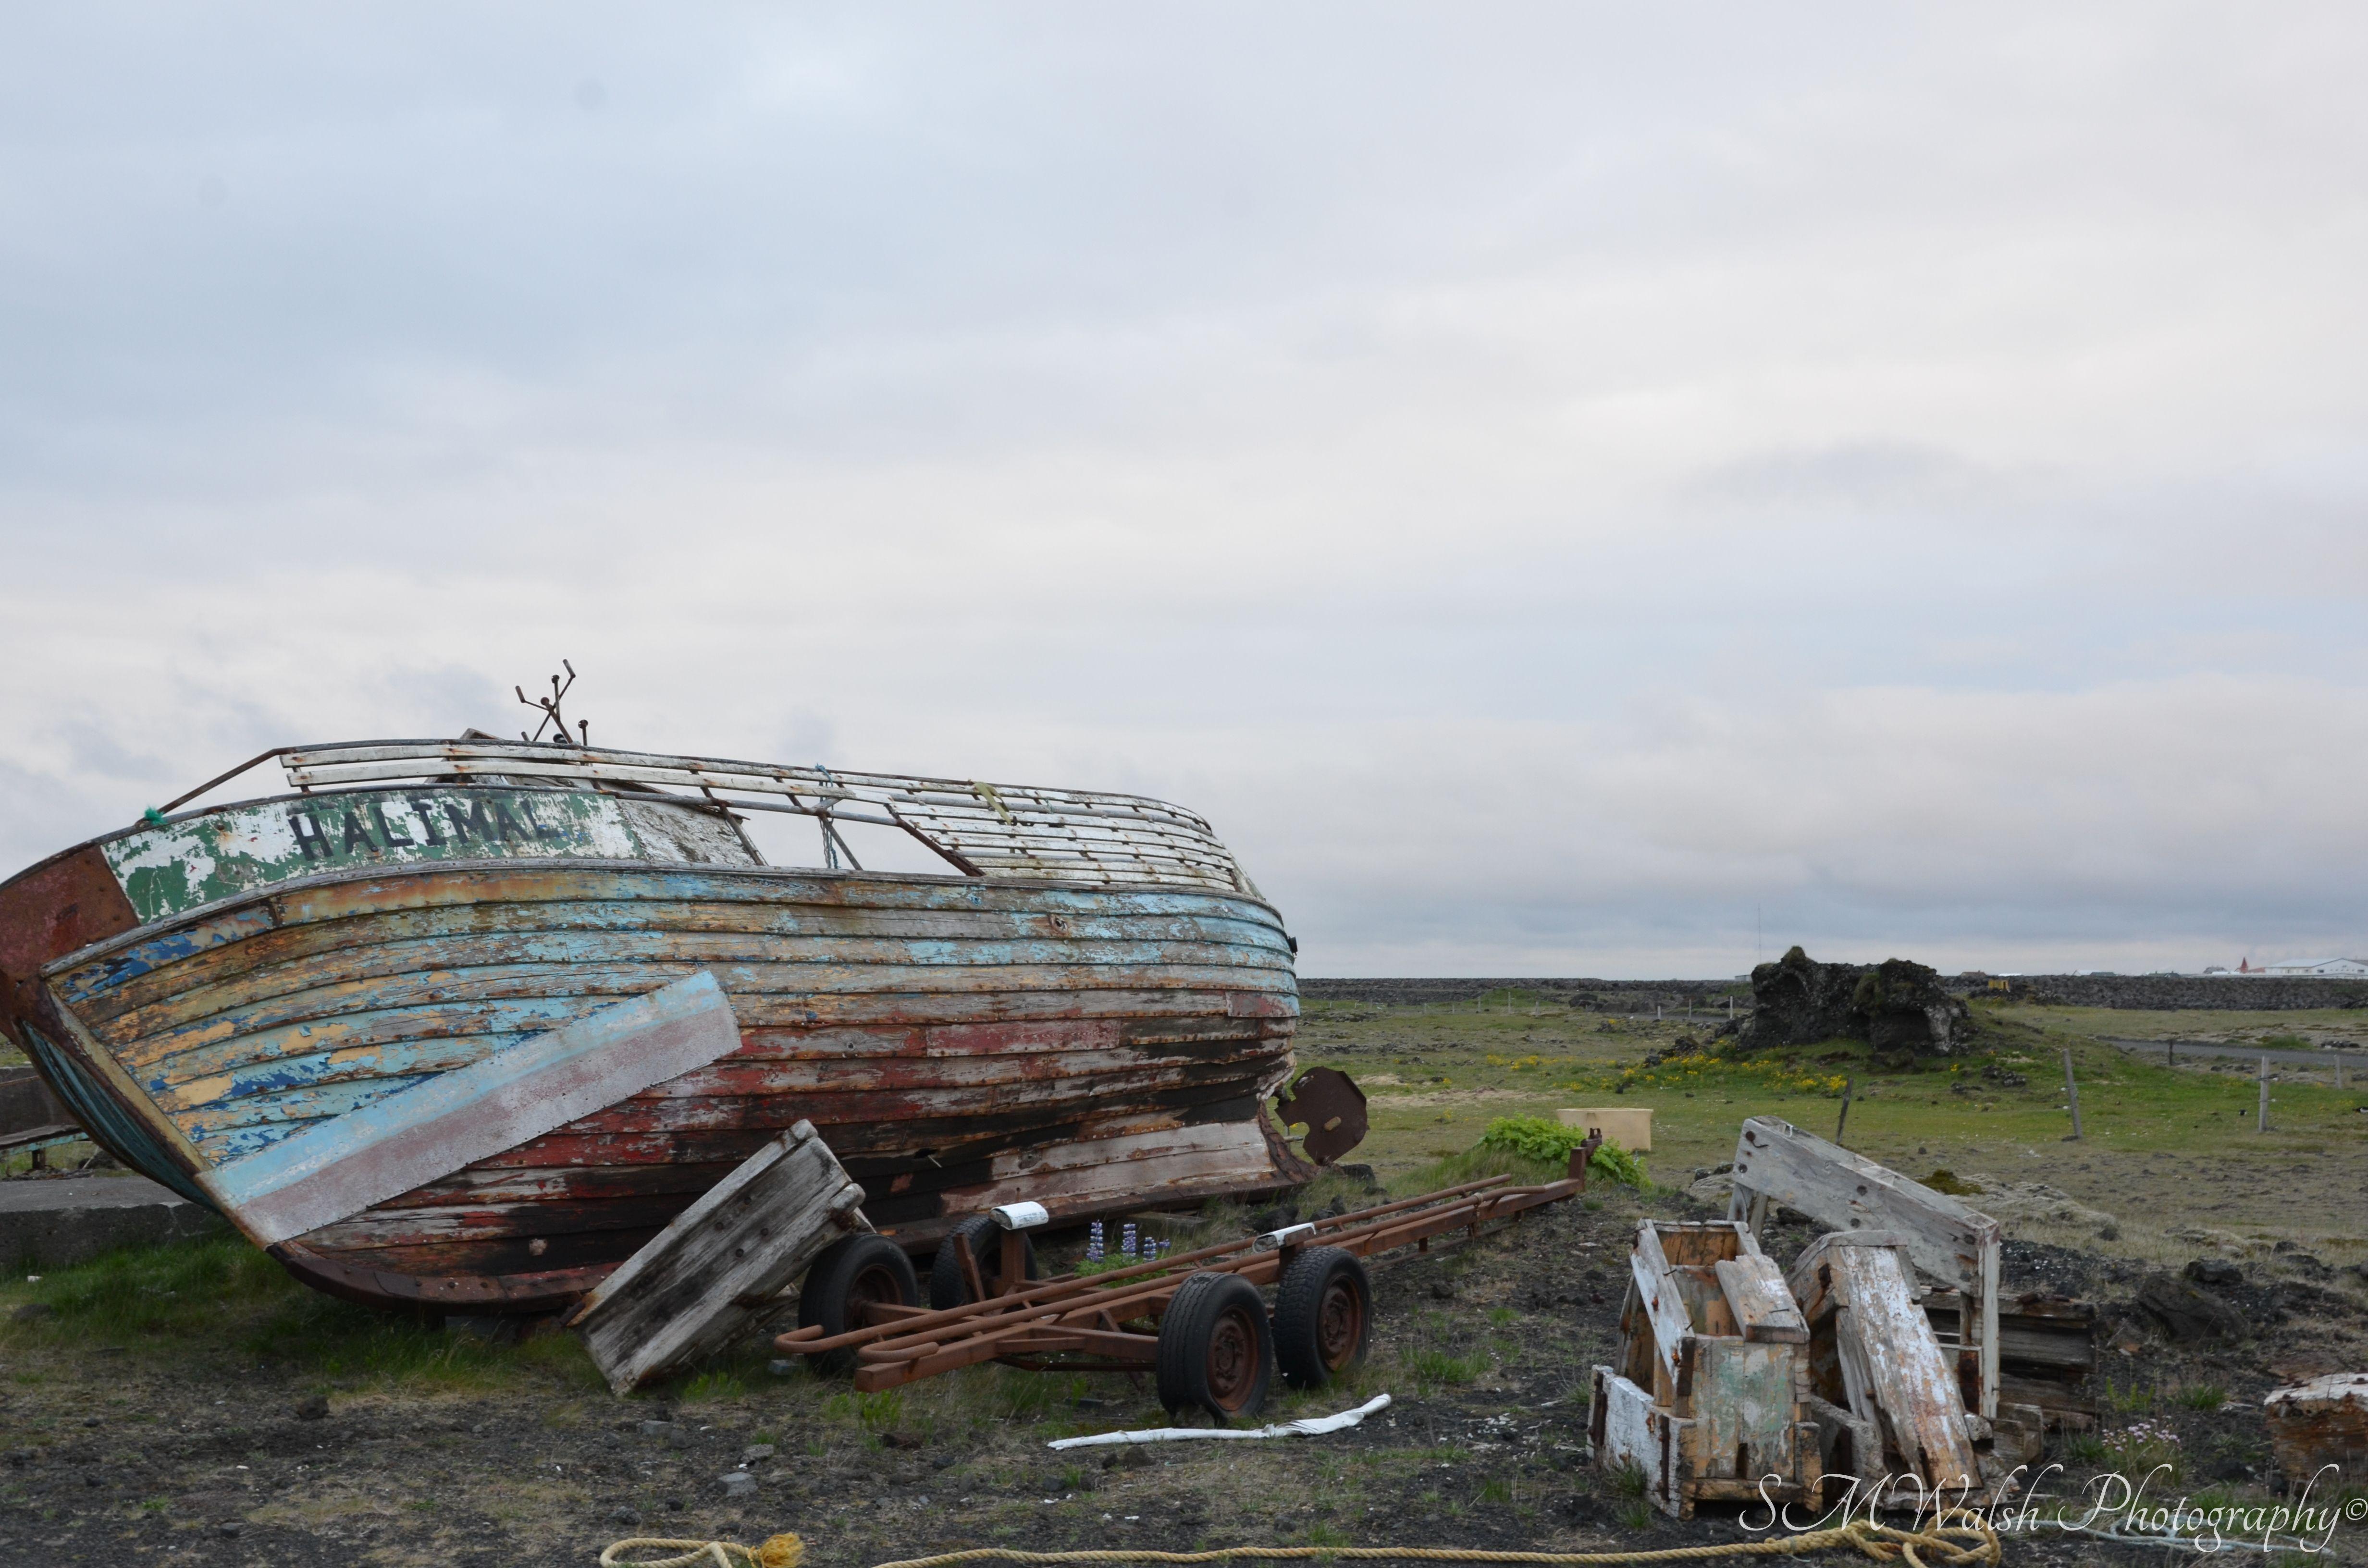 Weathered and worn, landlocked beauty at Grindavik Iceland https://www.instagram.com/attitude.for.latitude/